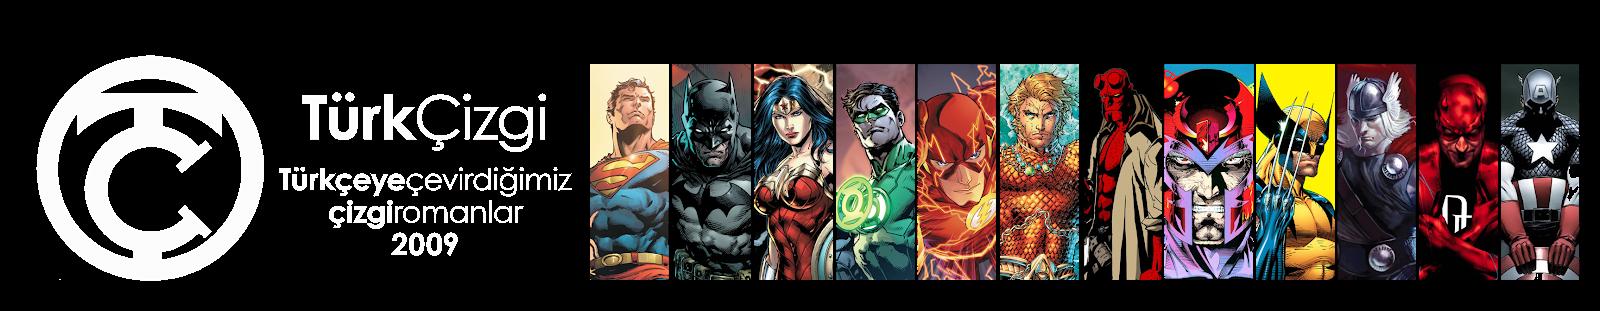 TürkÇizgi   Batman, Spider-Man, Wolverine, Green Lantern, The Flash, Thor   Çizgi Roman Çevirileri